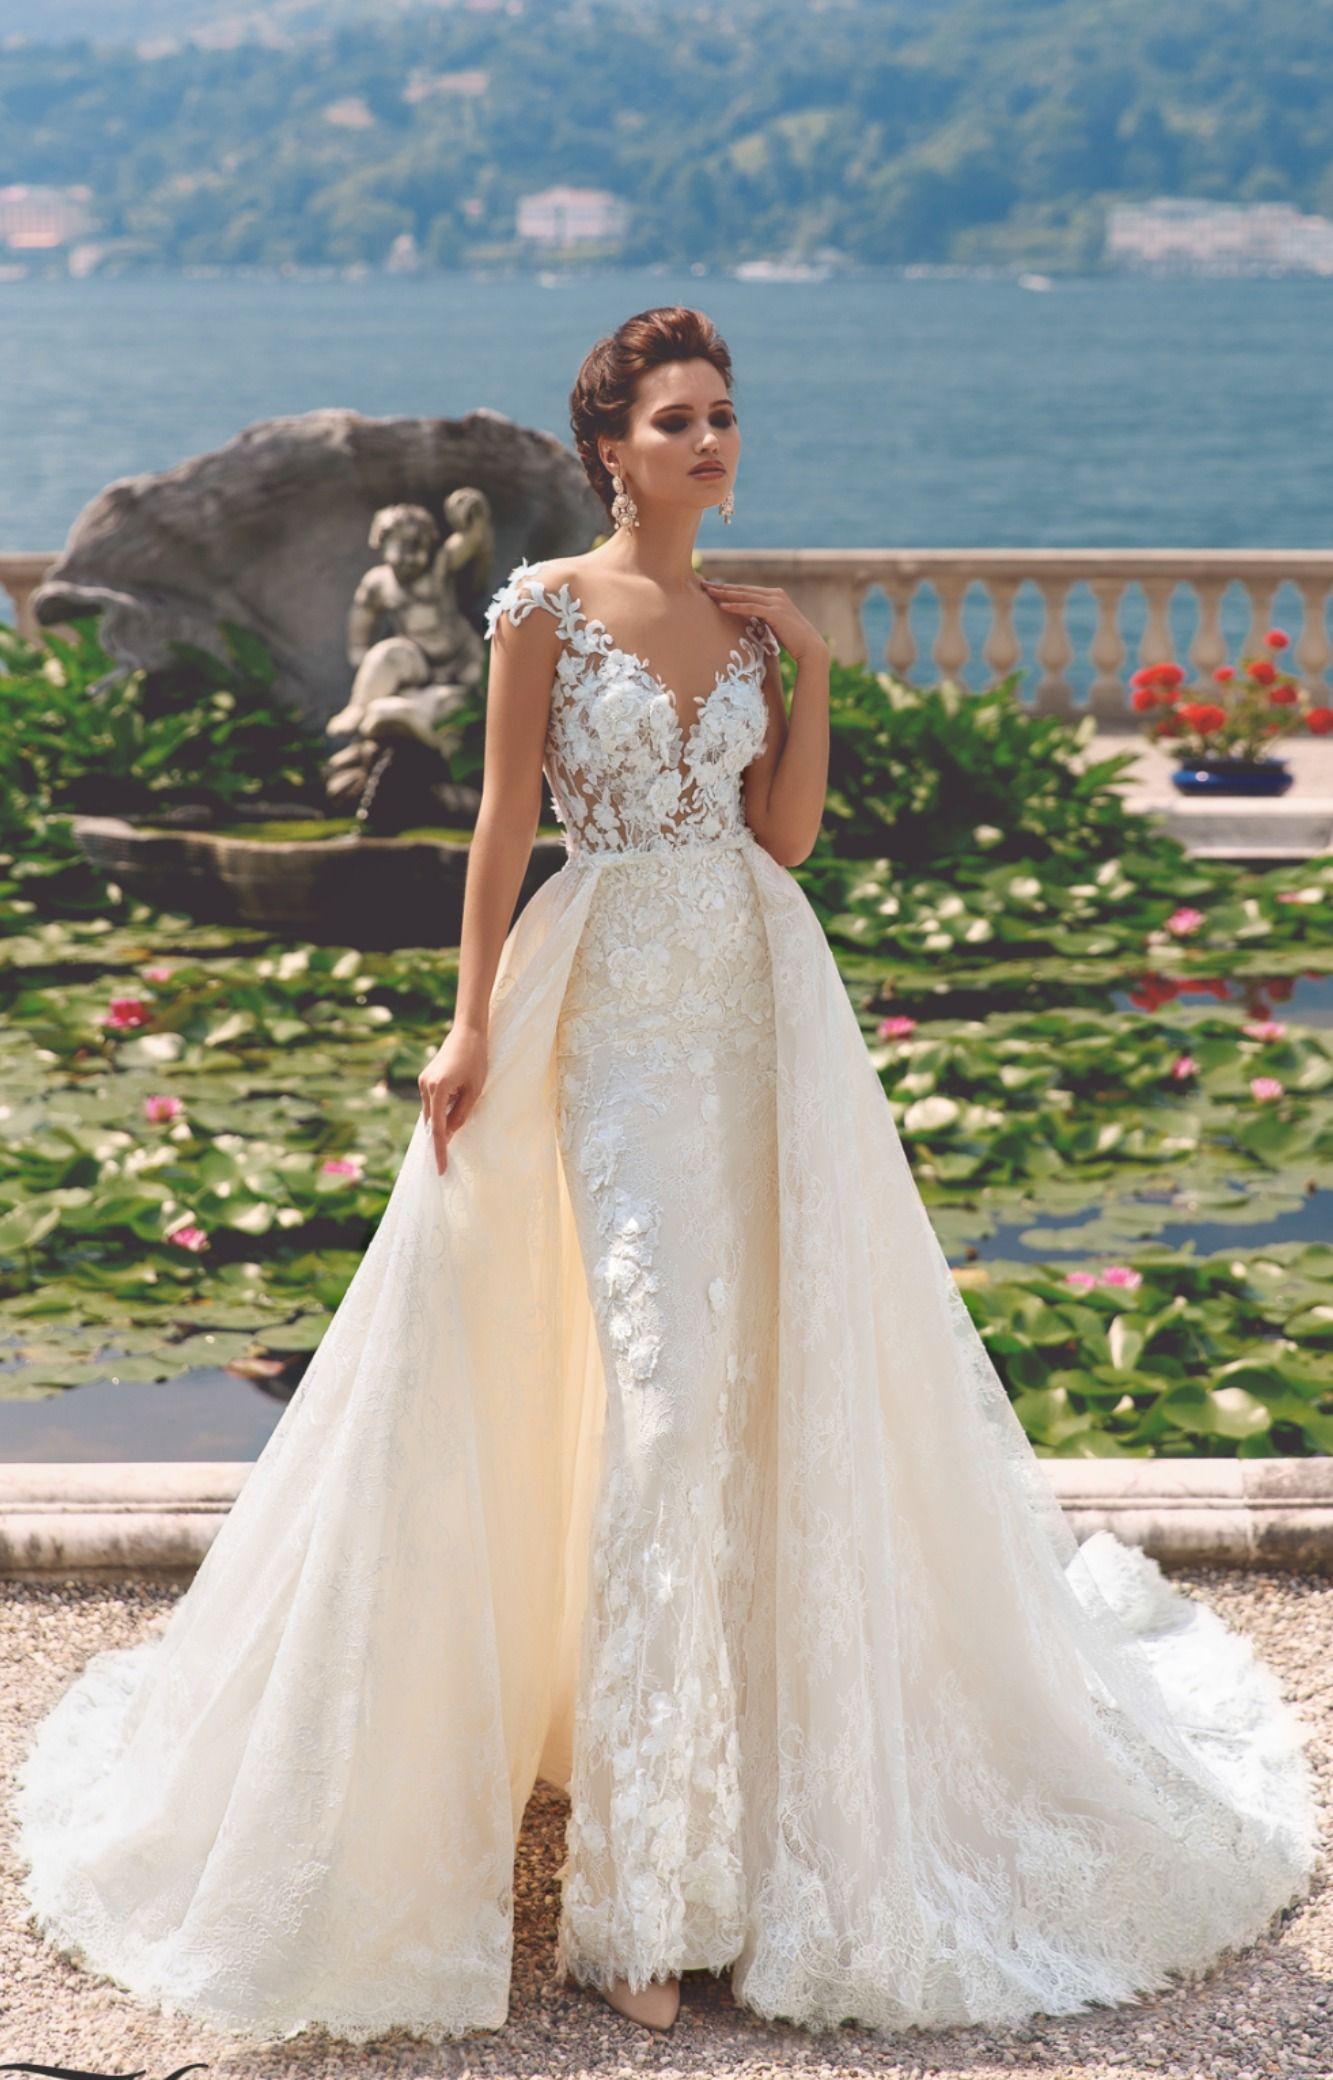 Karen Wedding Dress Queen Of The Hearts Collection Cheap Wedding Dress Detachable Train Wedding Dress White Lace Wedding Dress [ 2080 x 1333 Pixel ]